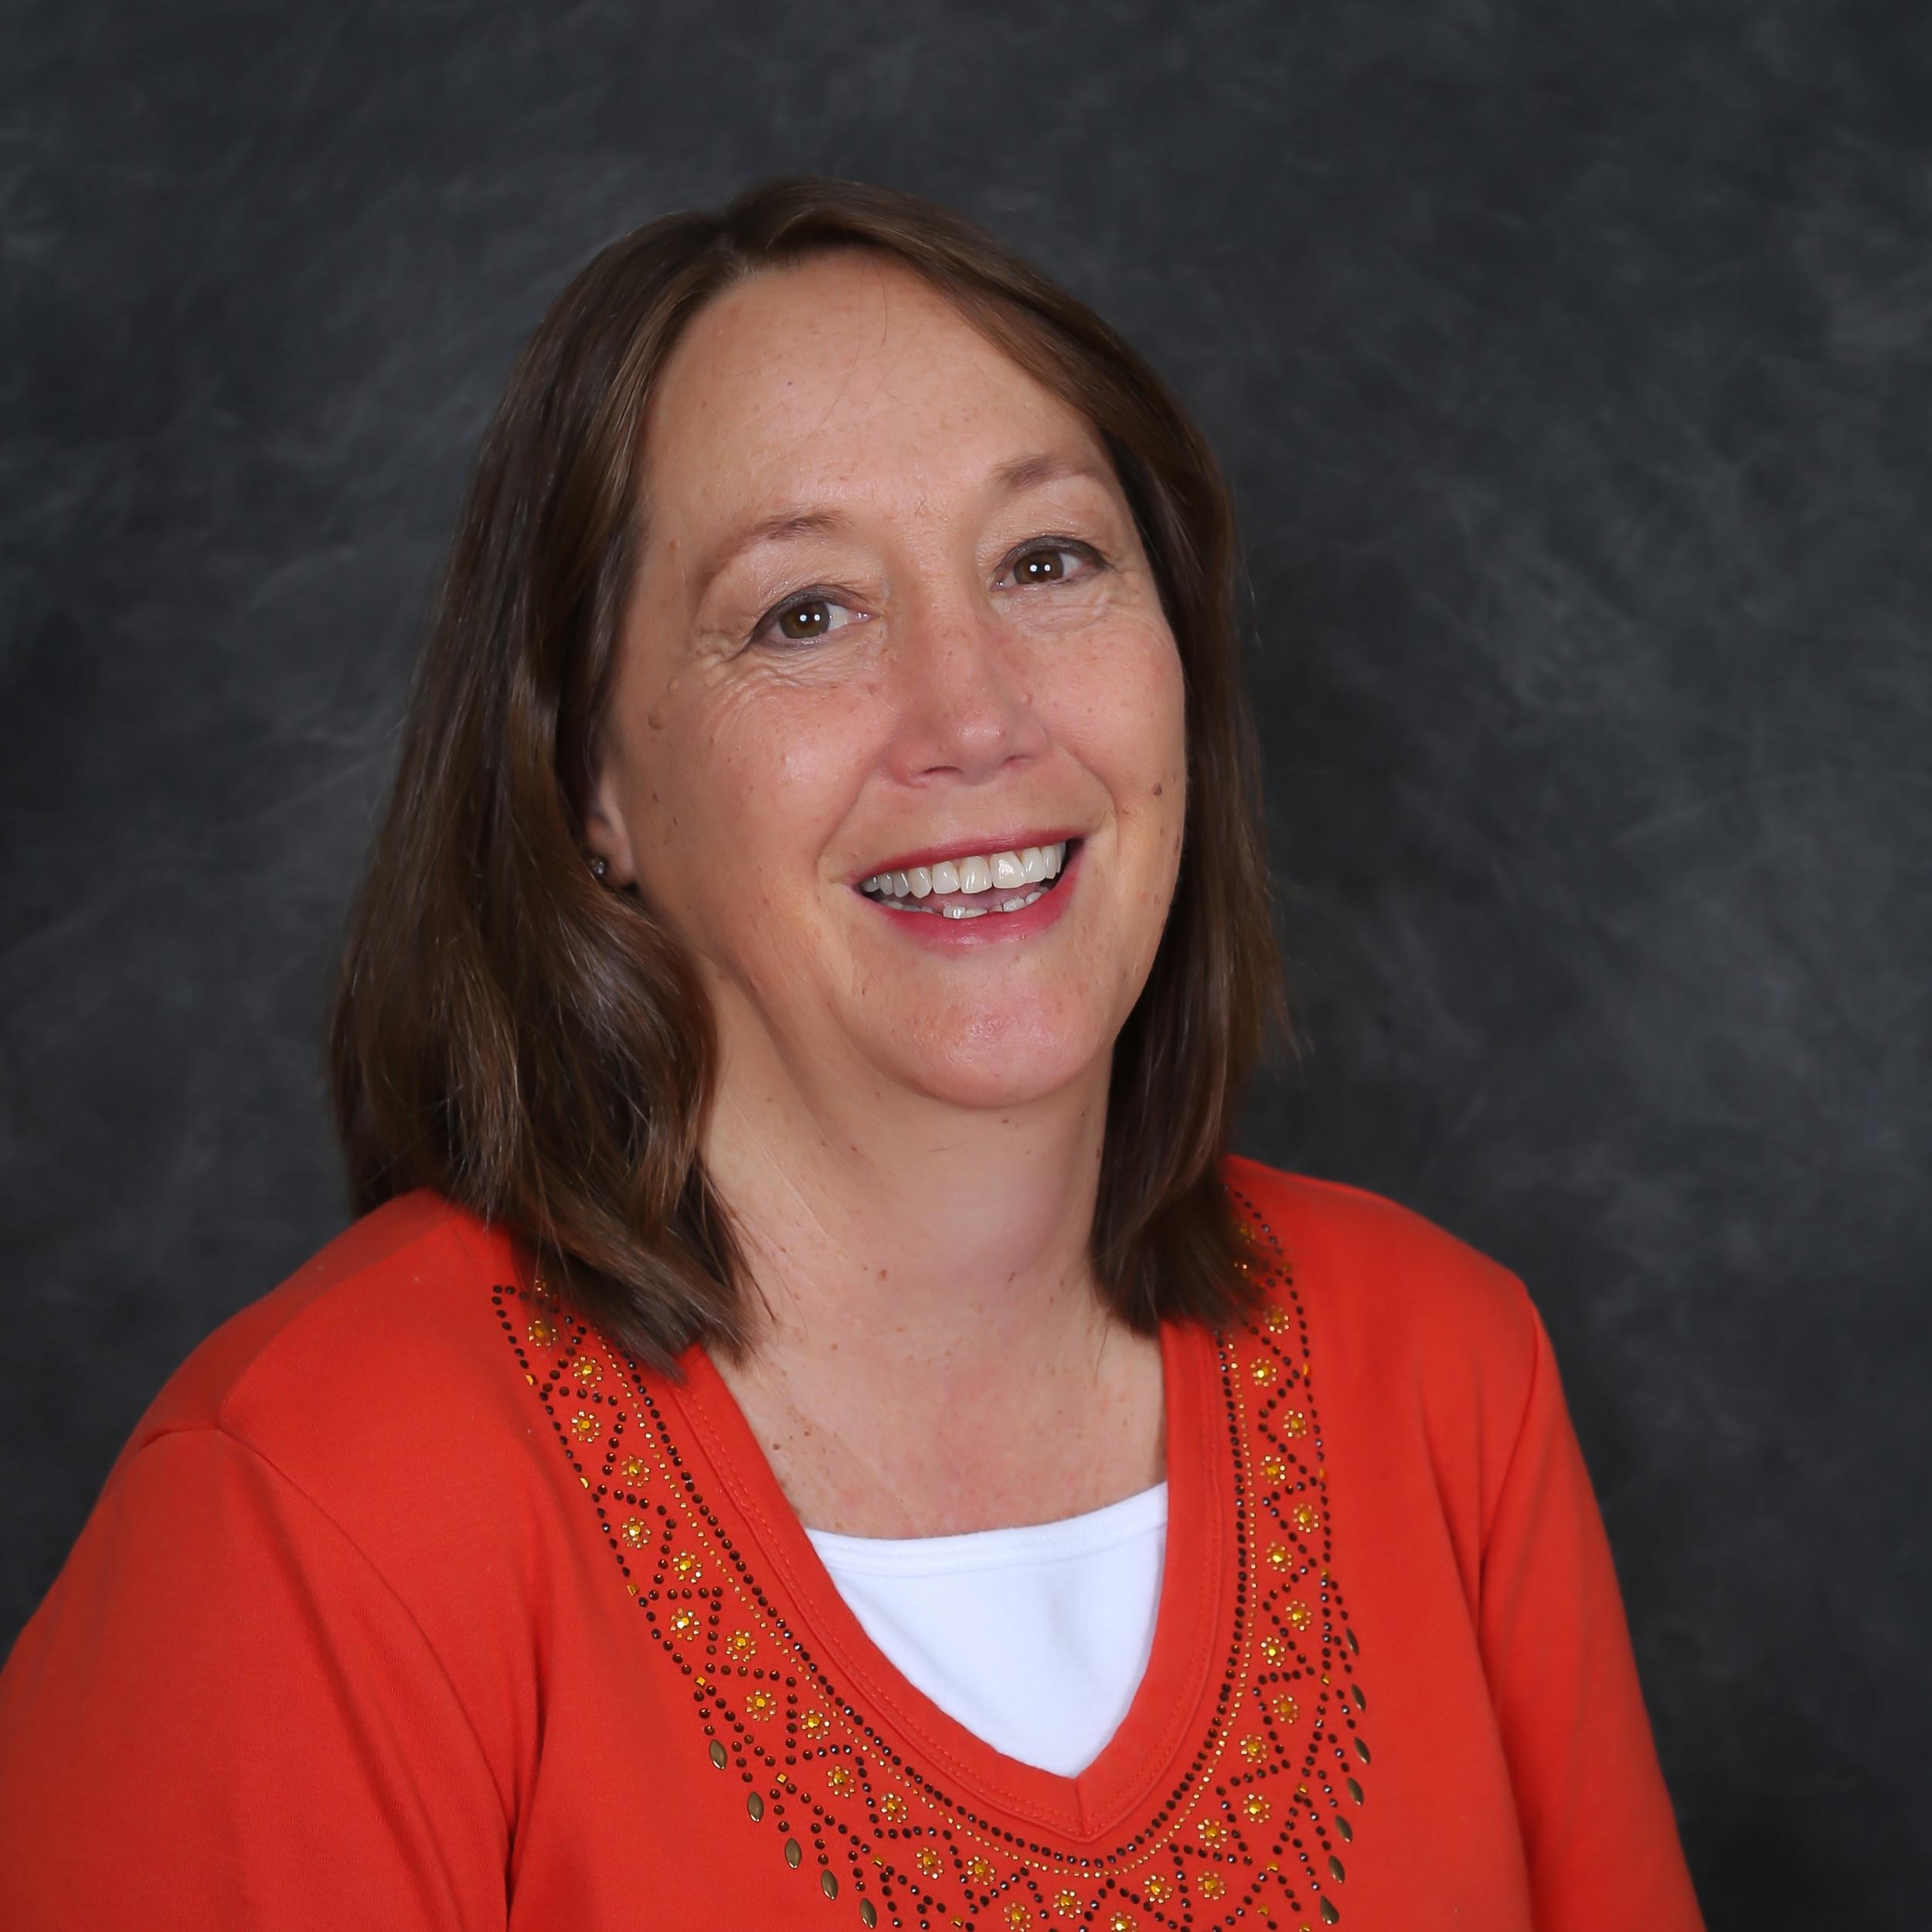 Lisa Nichols, EECC Director